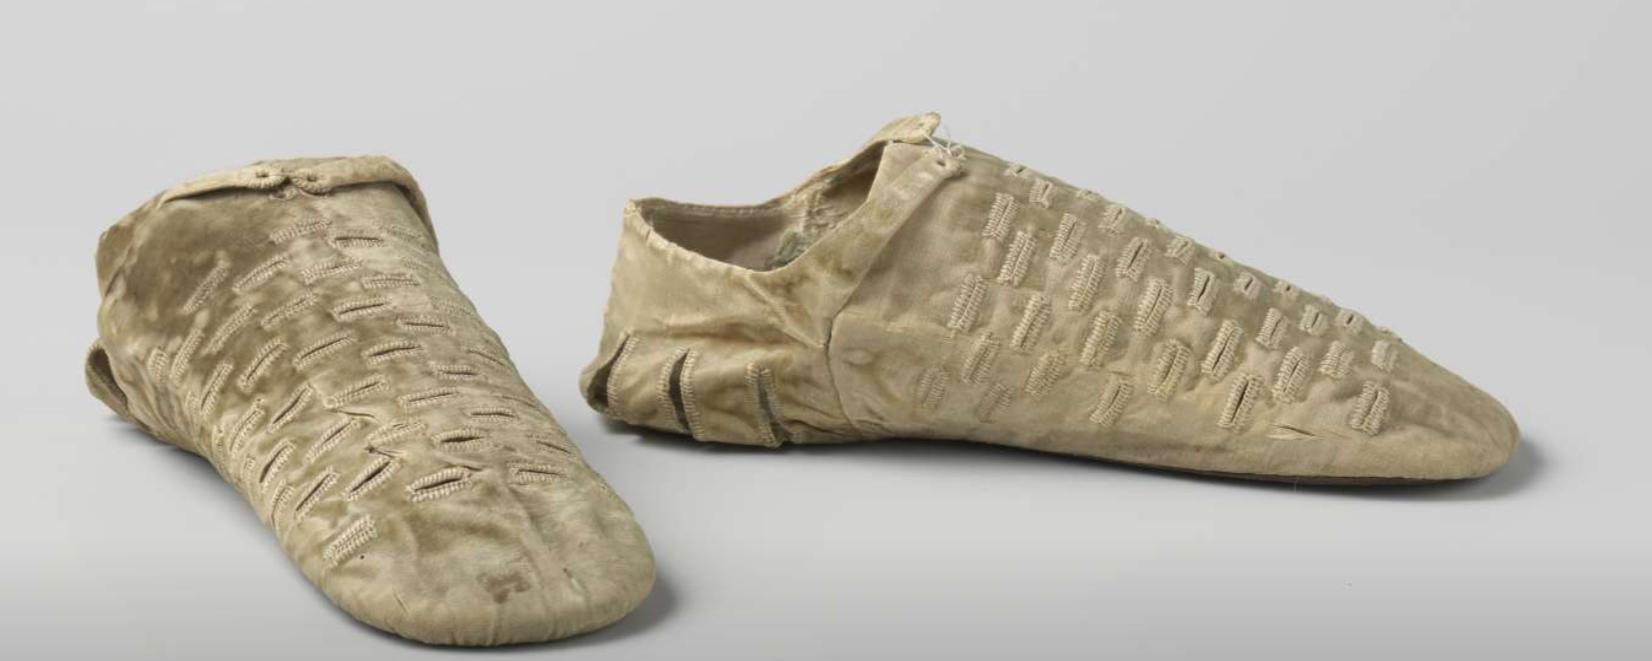 Tudor Foot Bag with Slashes